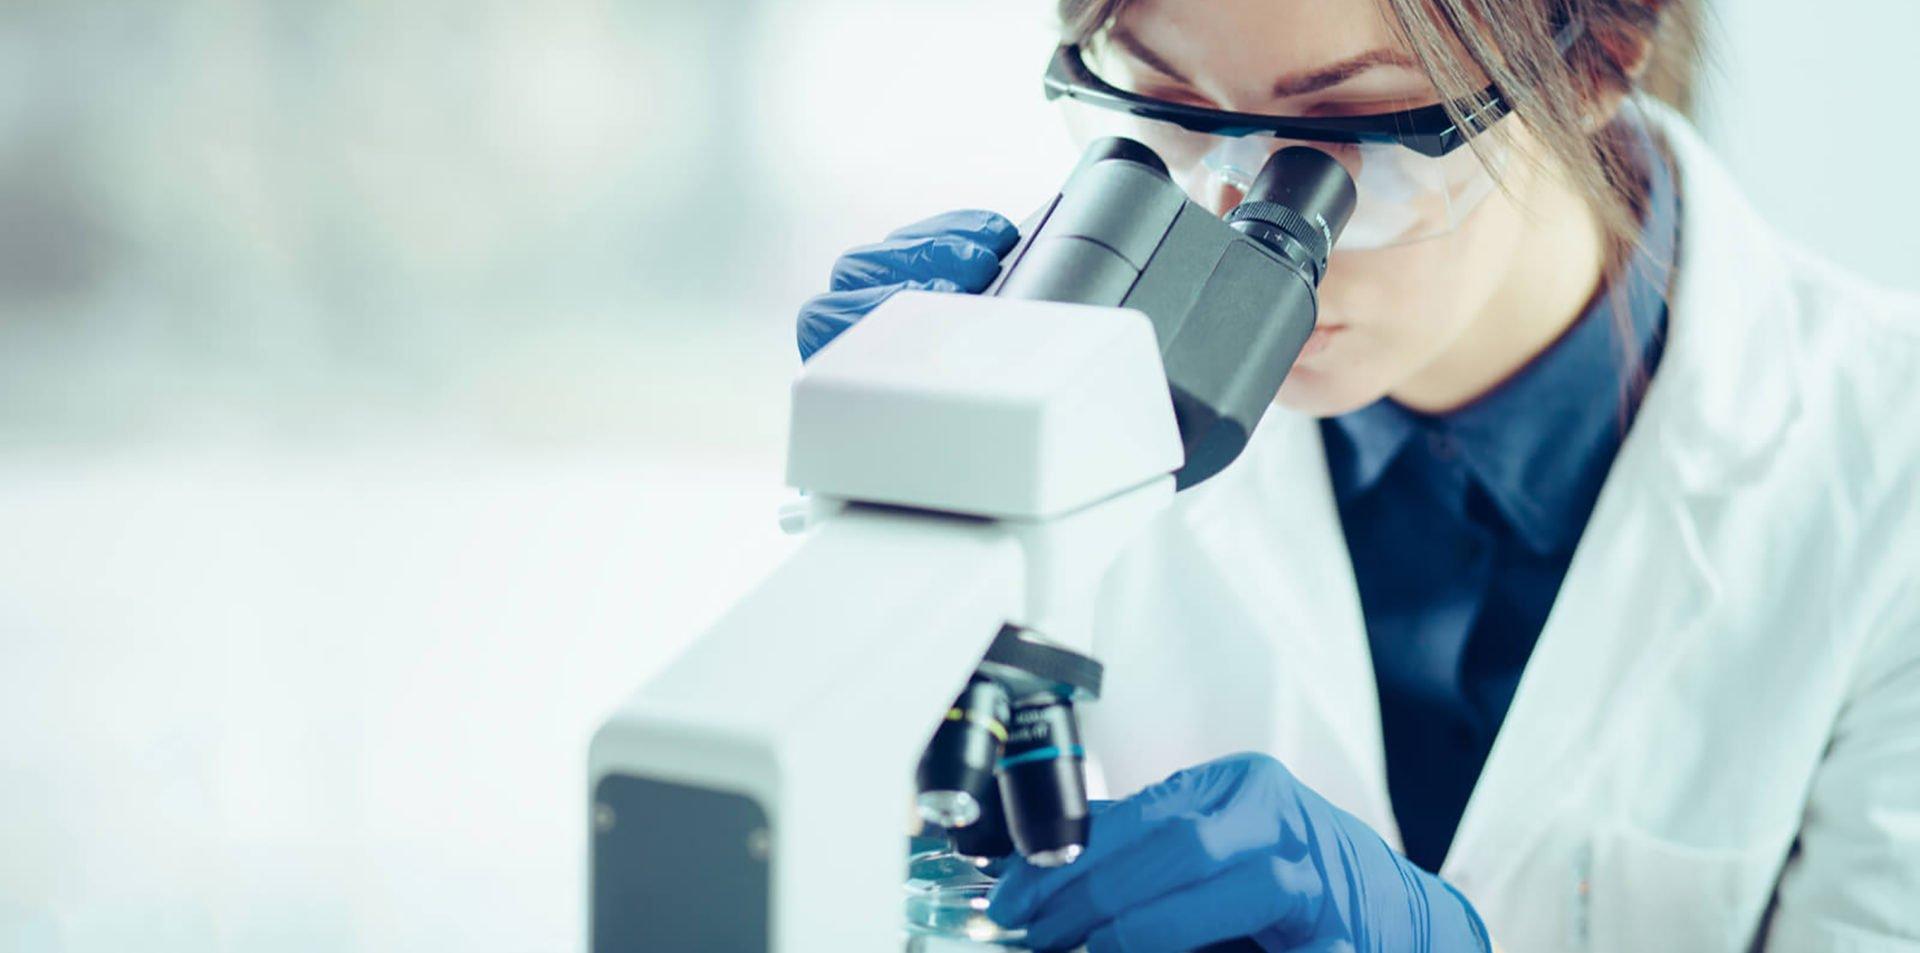 Diagnostics & Laboratory